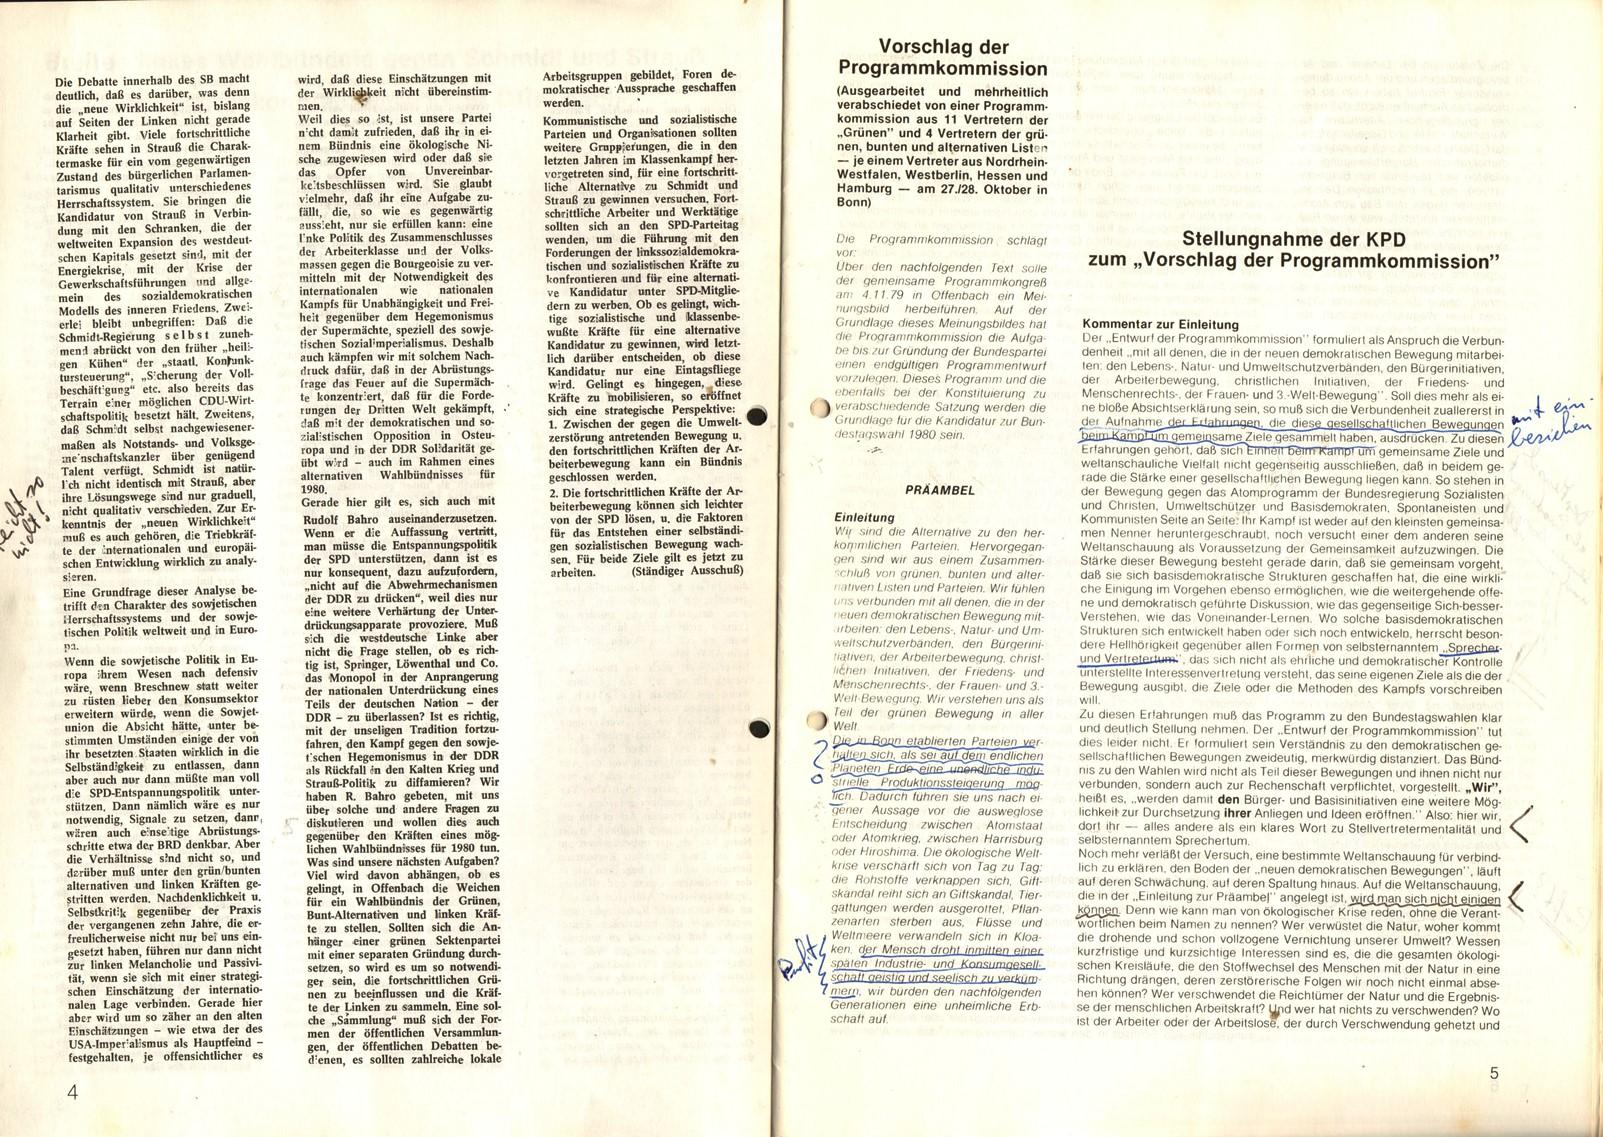 KPDAO_1979_Diskussion_Bundestagswahlen_1980_03